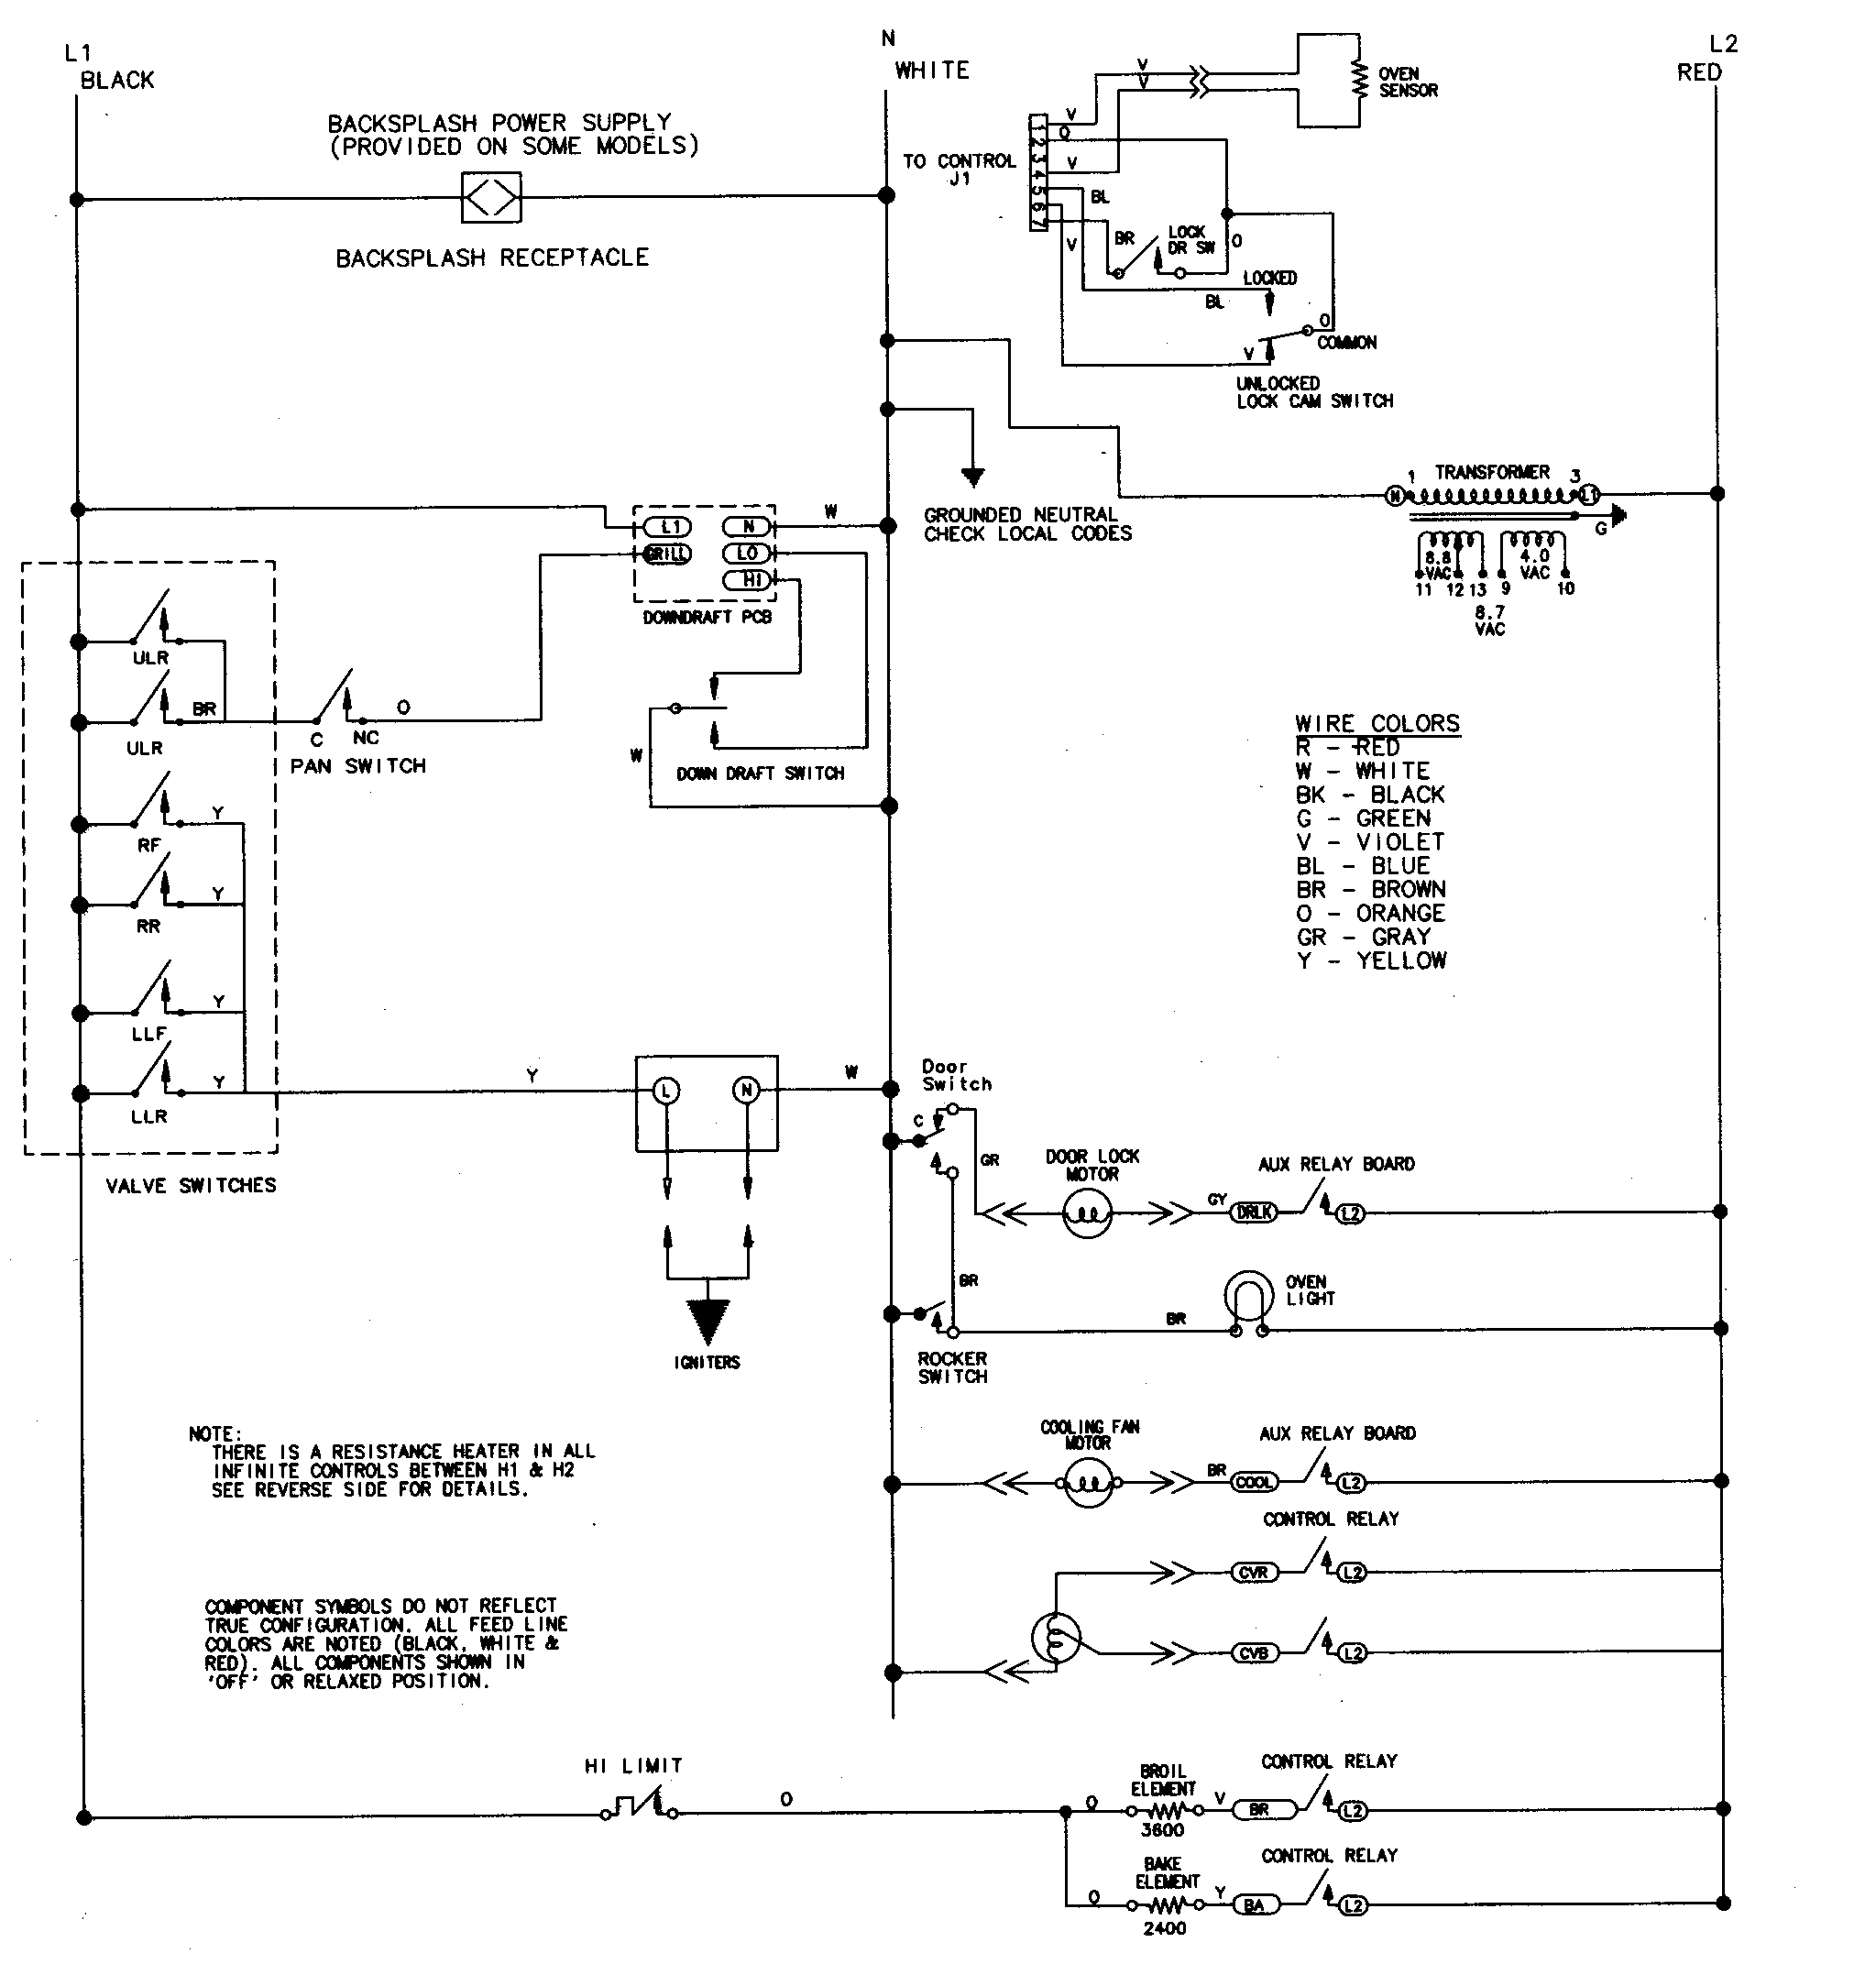 Jenn Air Wiring Diagrams - Wiring Diagrams List Gas Grill Wiring Diagram on